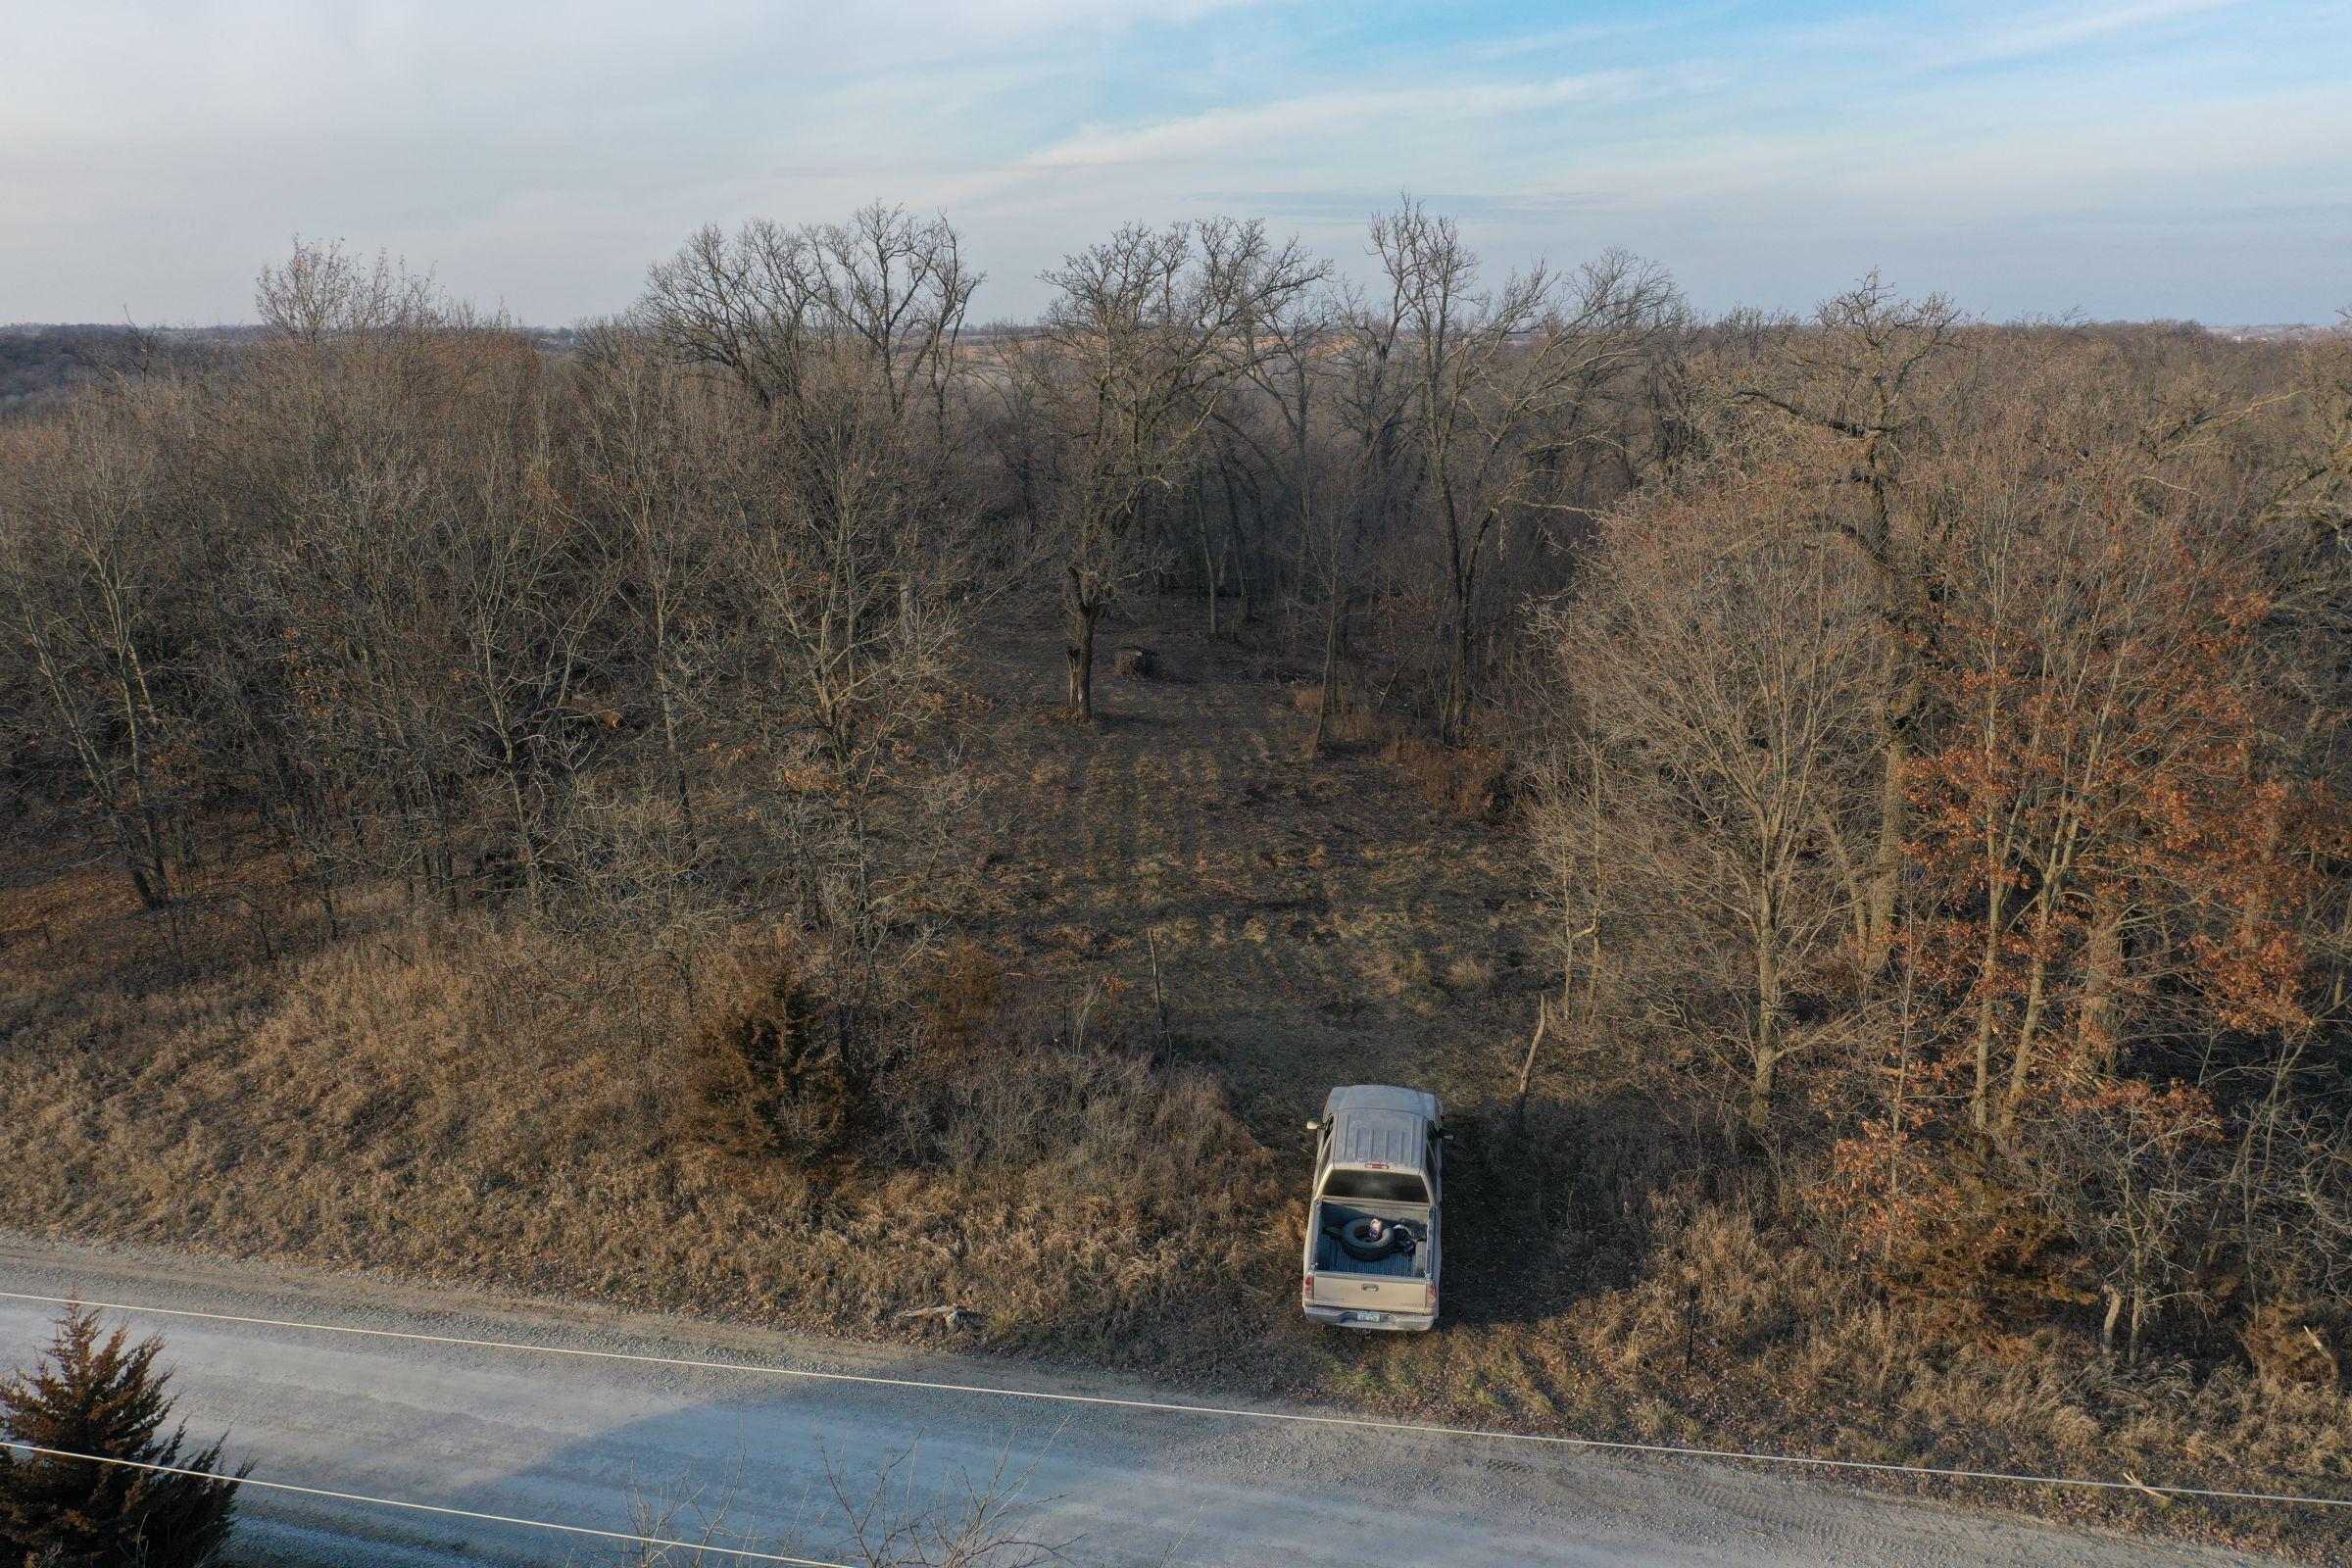 land-warren-county-iowa-10-acres-listing-number-15275-2-2020-12-11-165139.jpg